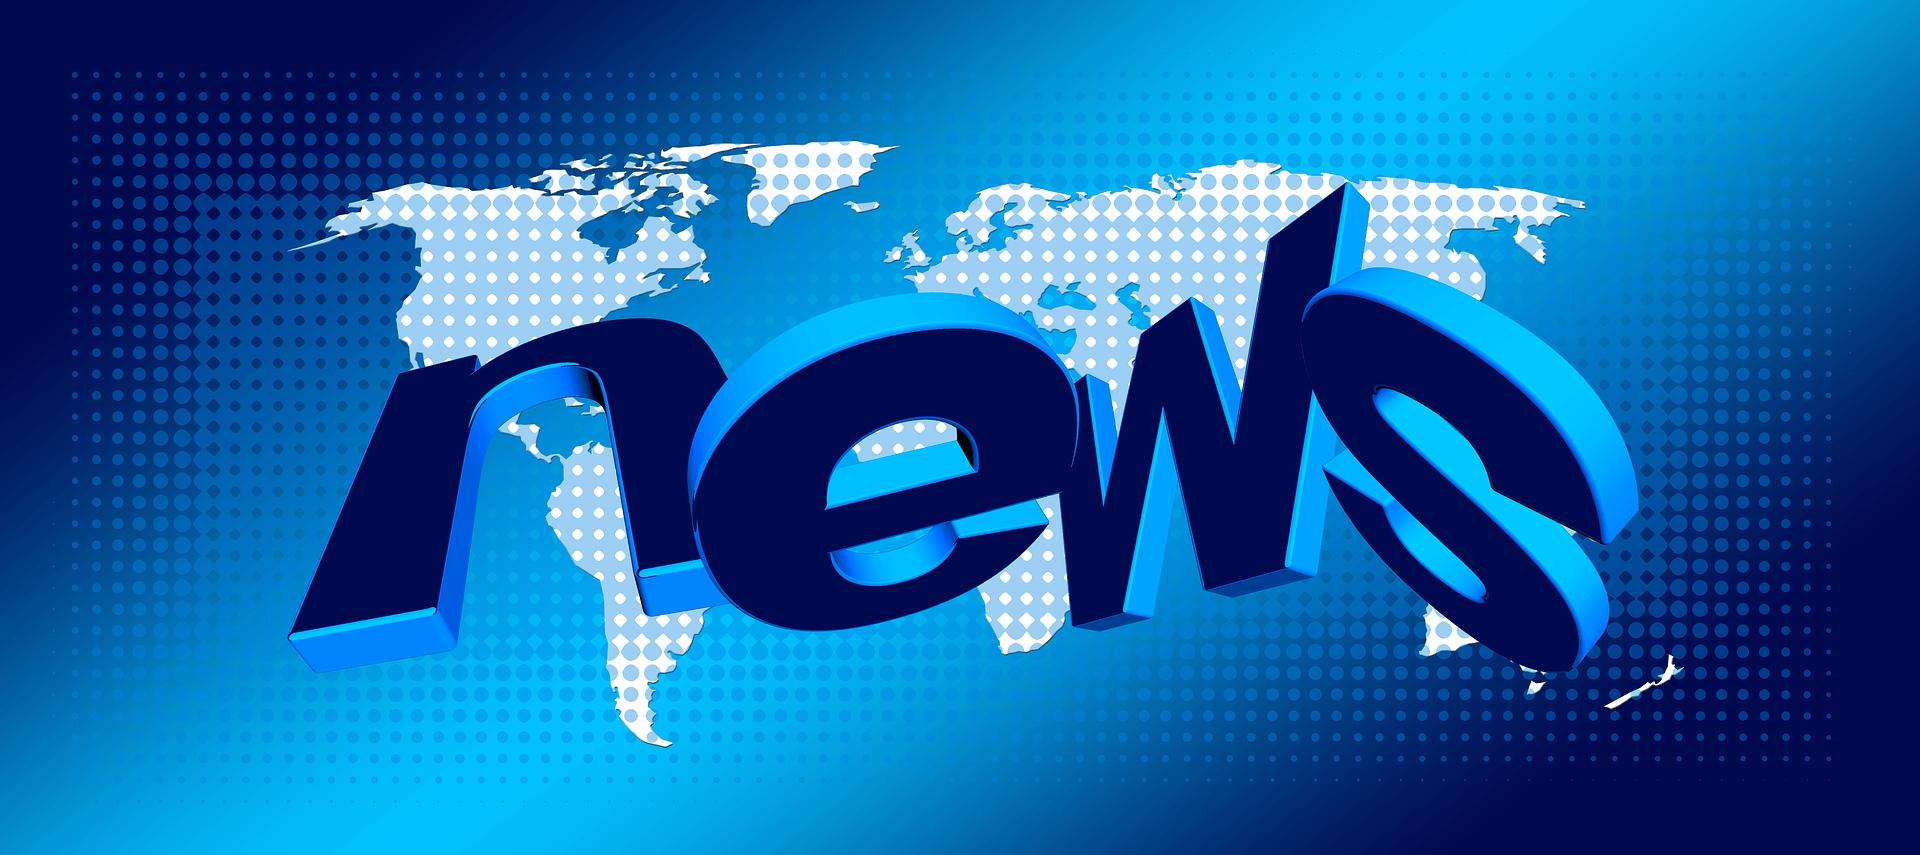 World News Special | Top News Summary – 15/JUN/2019 | Quick View